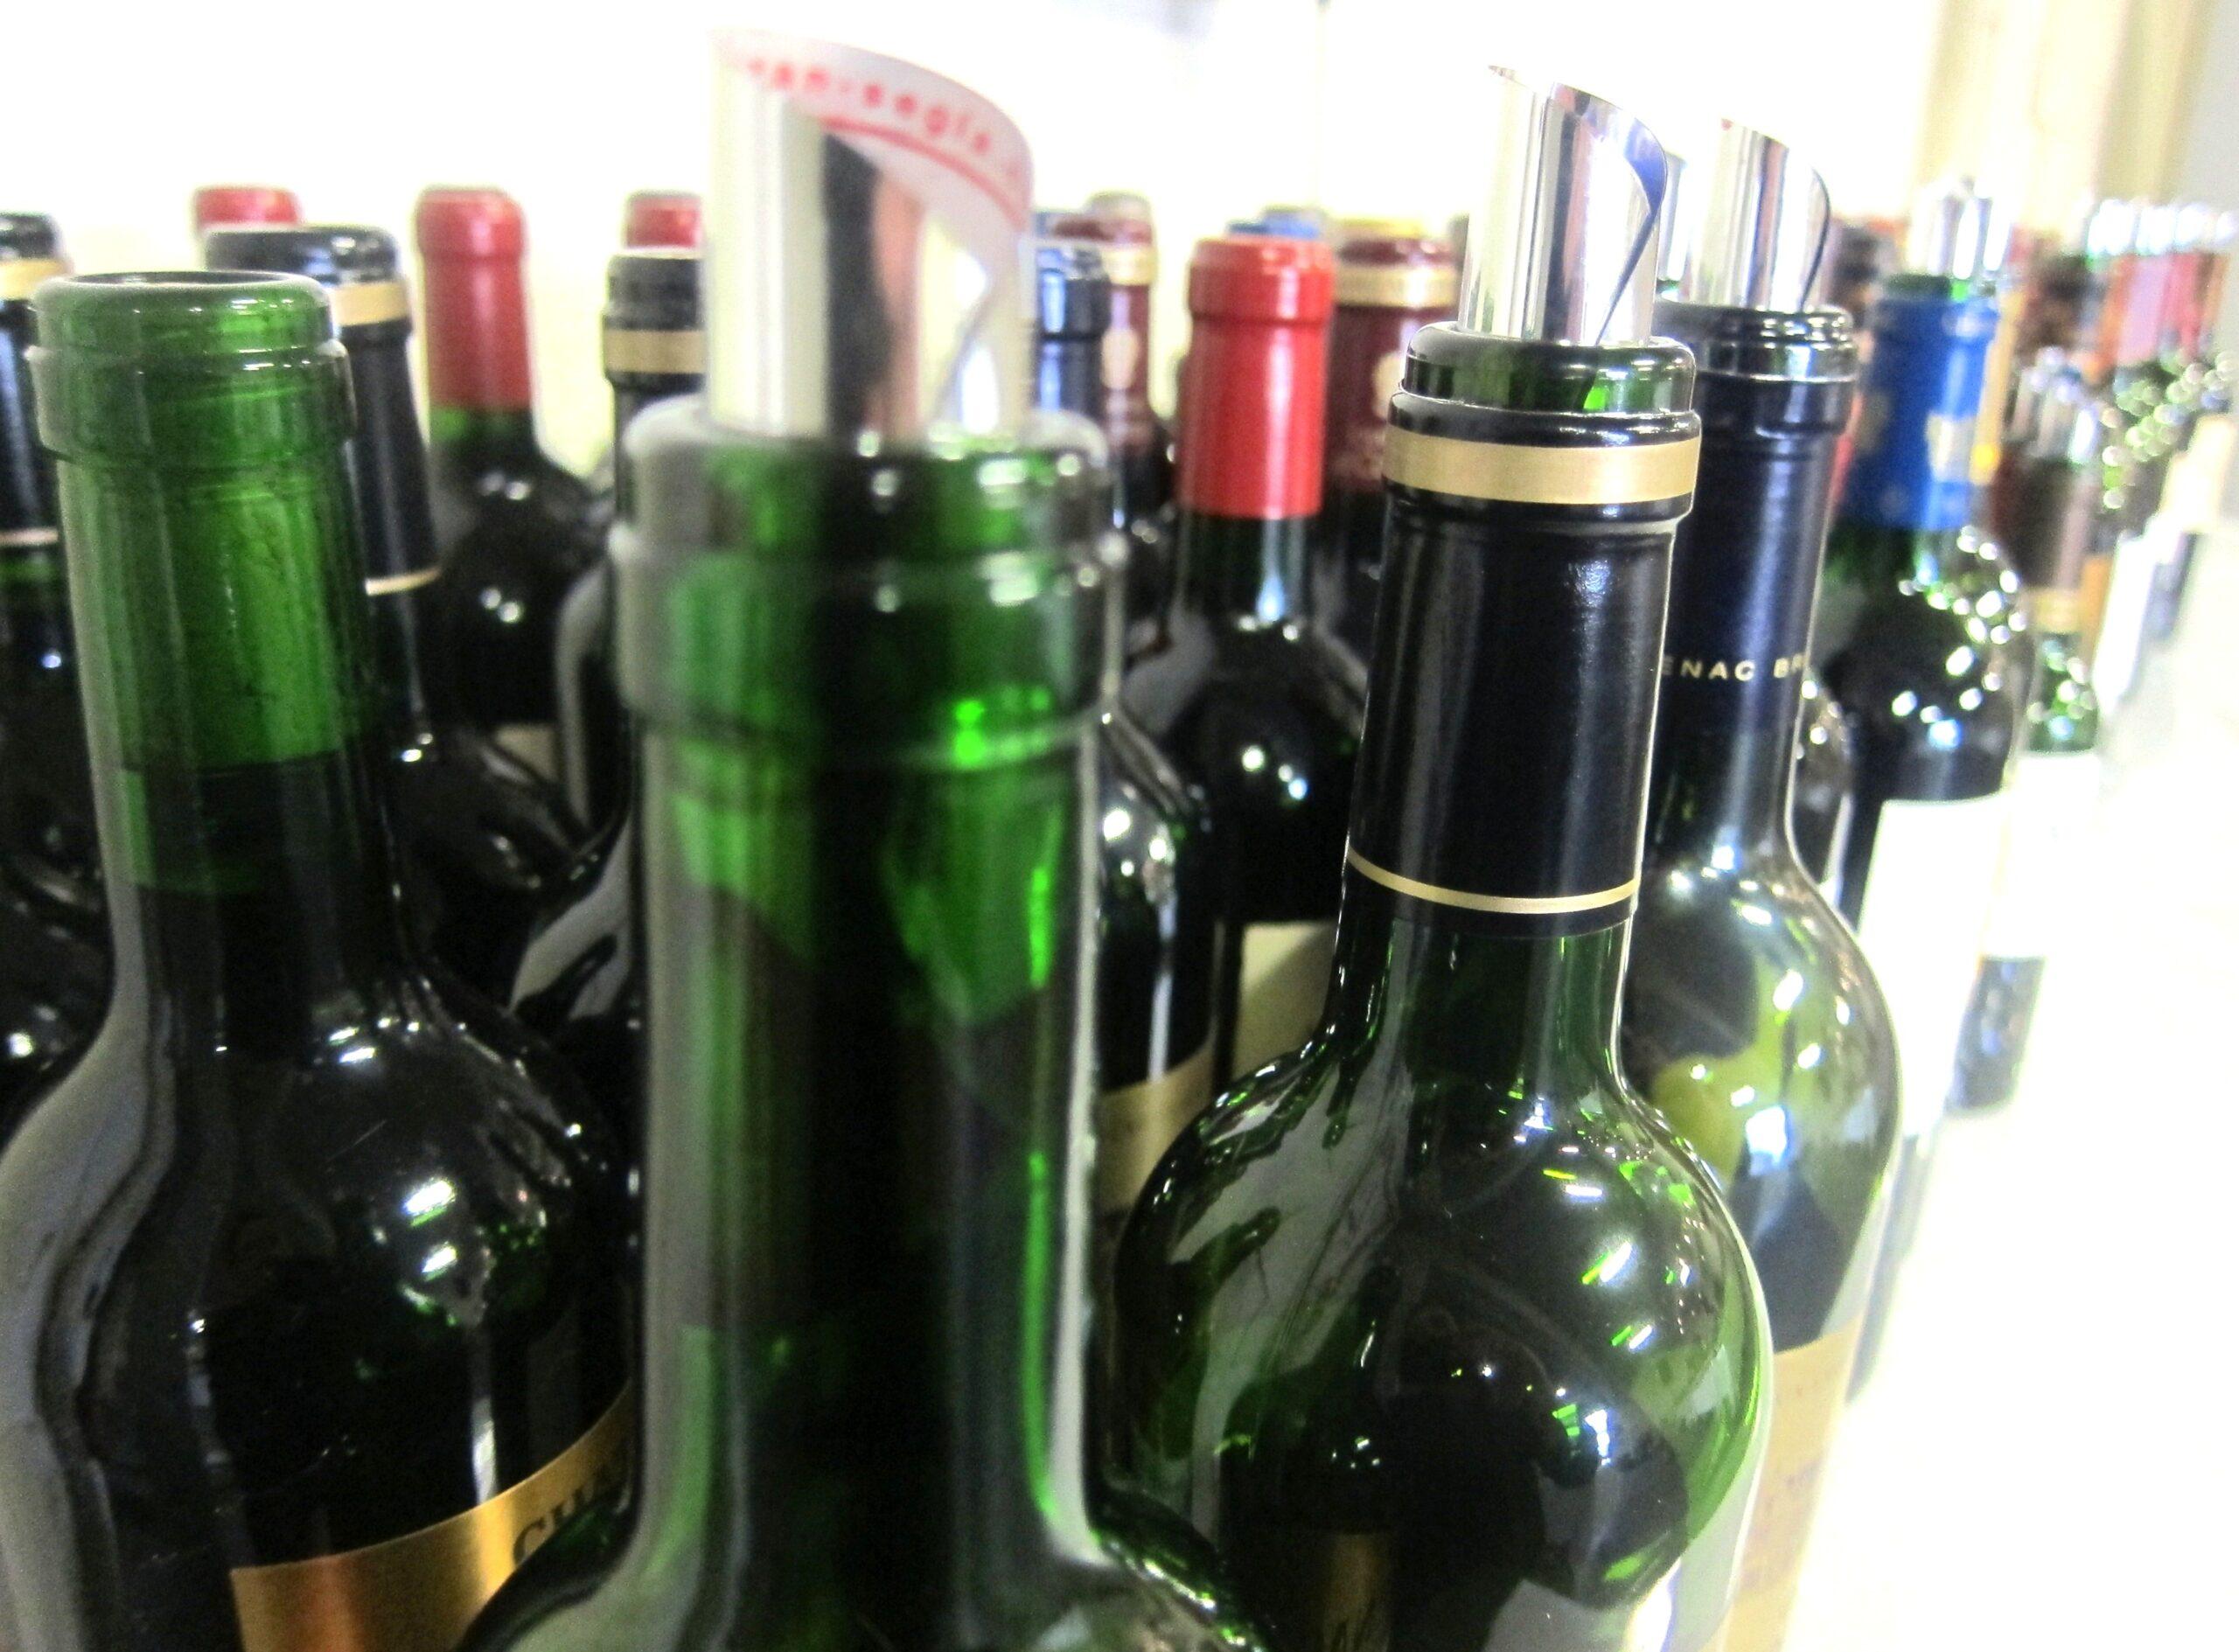 2010 Haut Medoc Bordeaux Wine Guide Tasting Notes Ratings